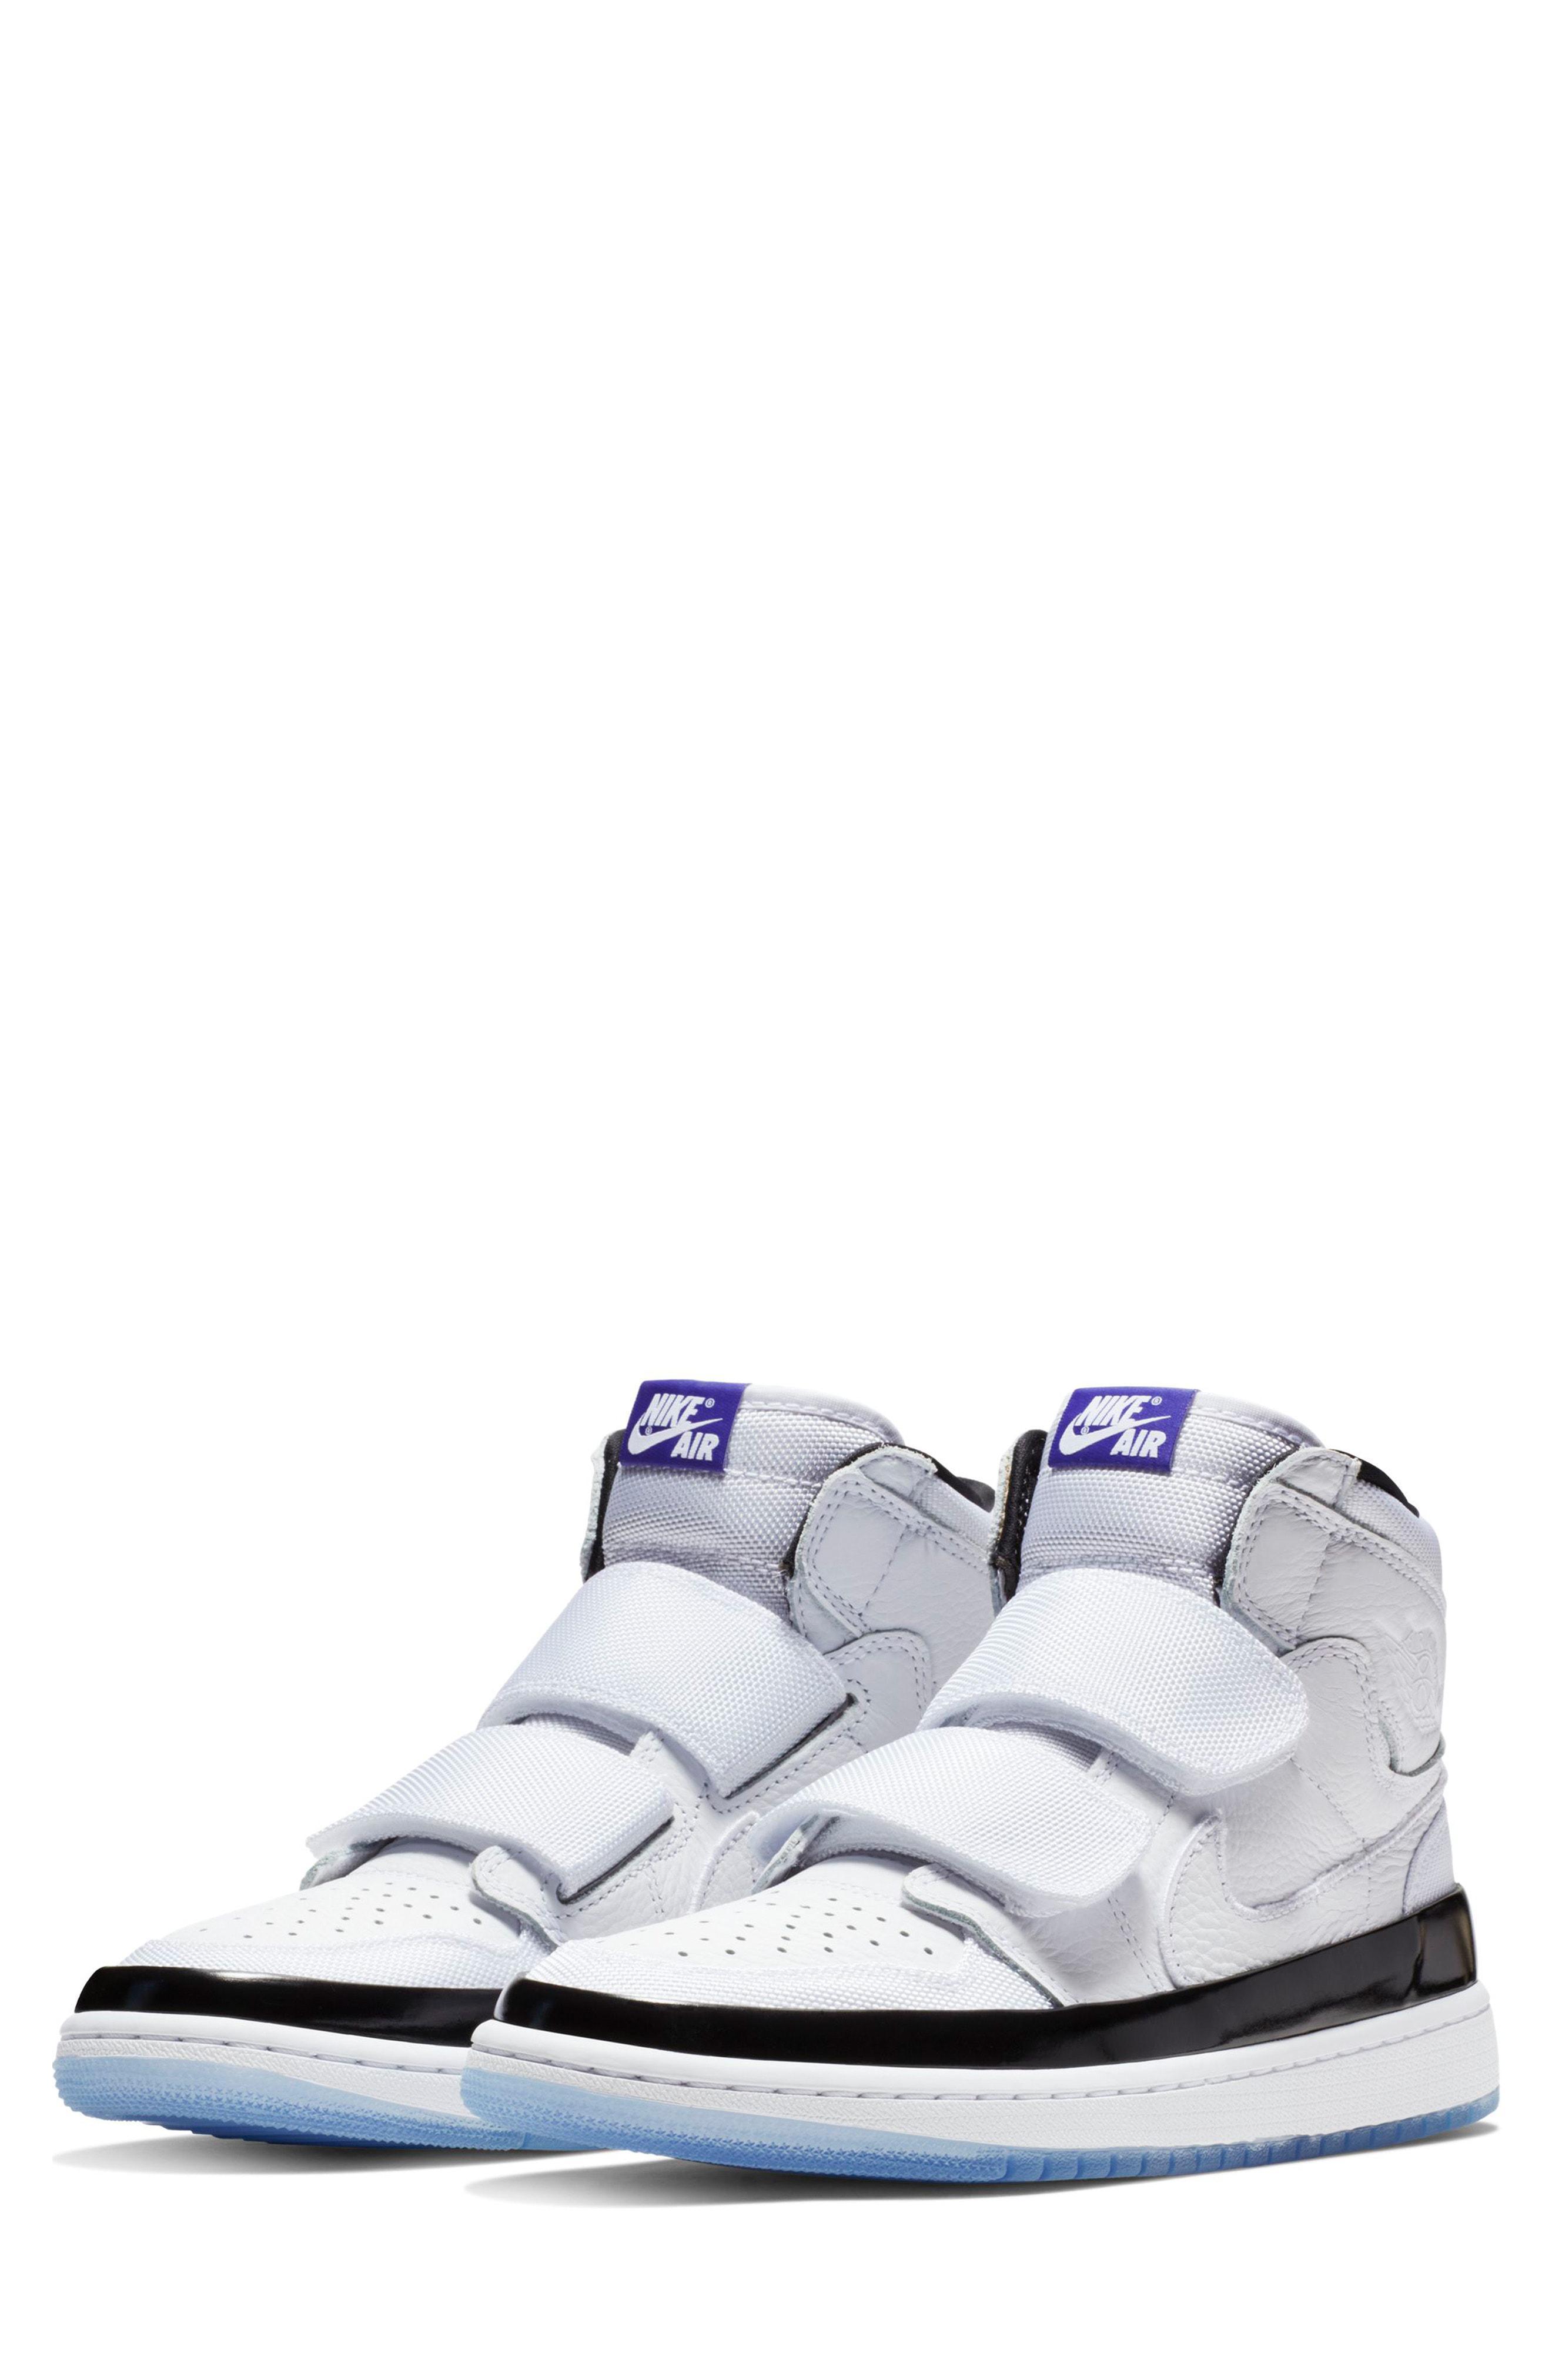 9d7351247dfb Lyst - Nike Air Jordan 1 Retro High Double Strap Sneaker in Brown ...